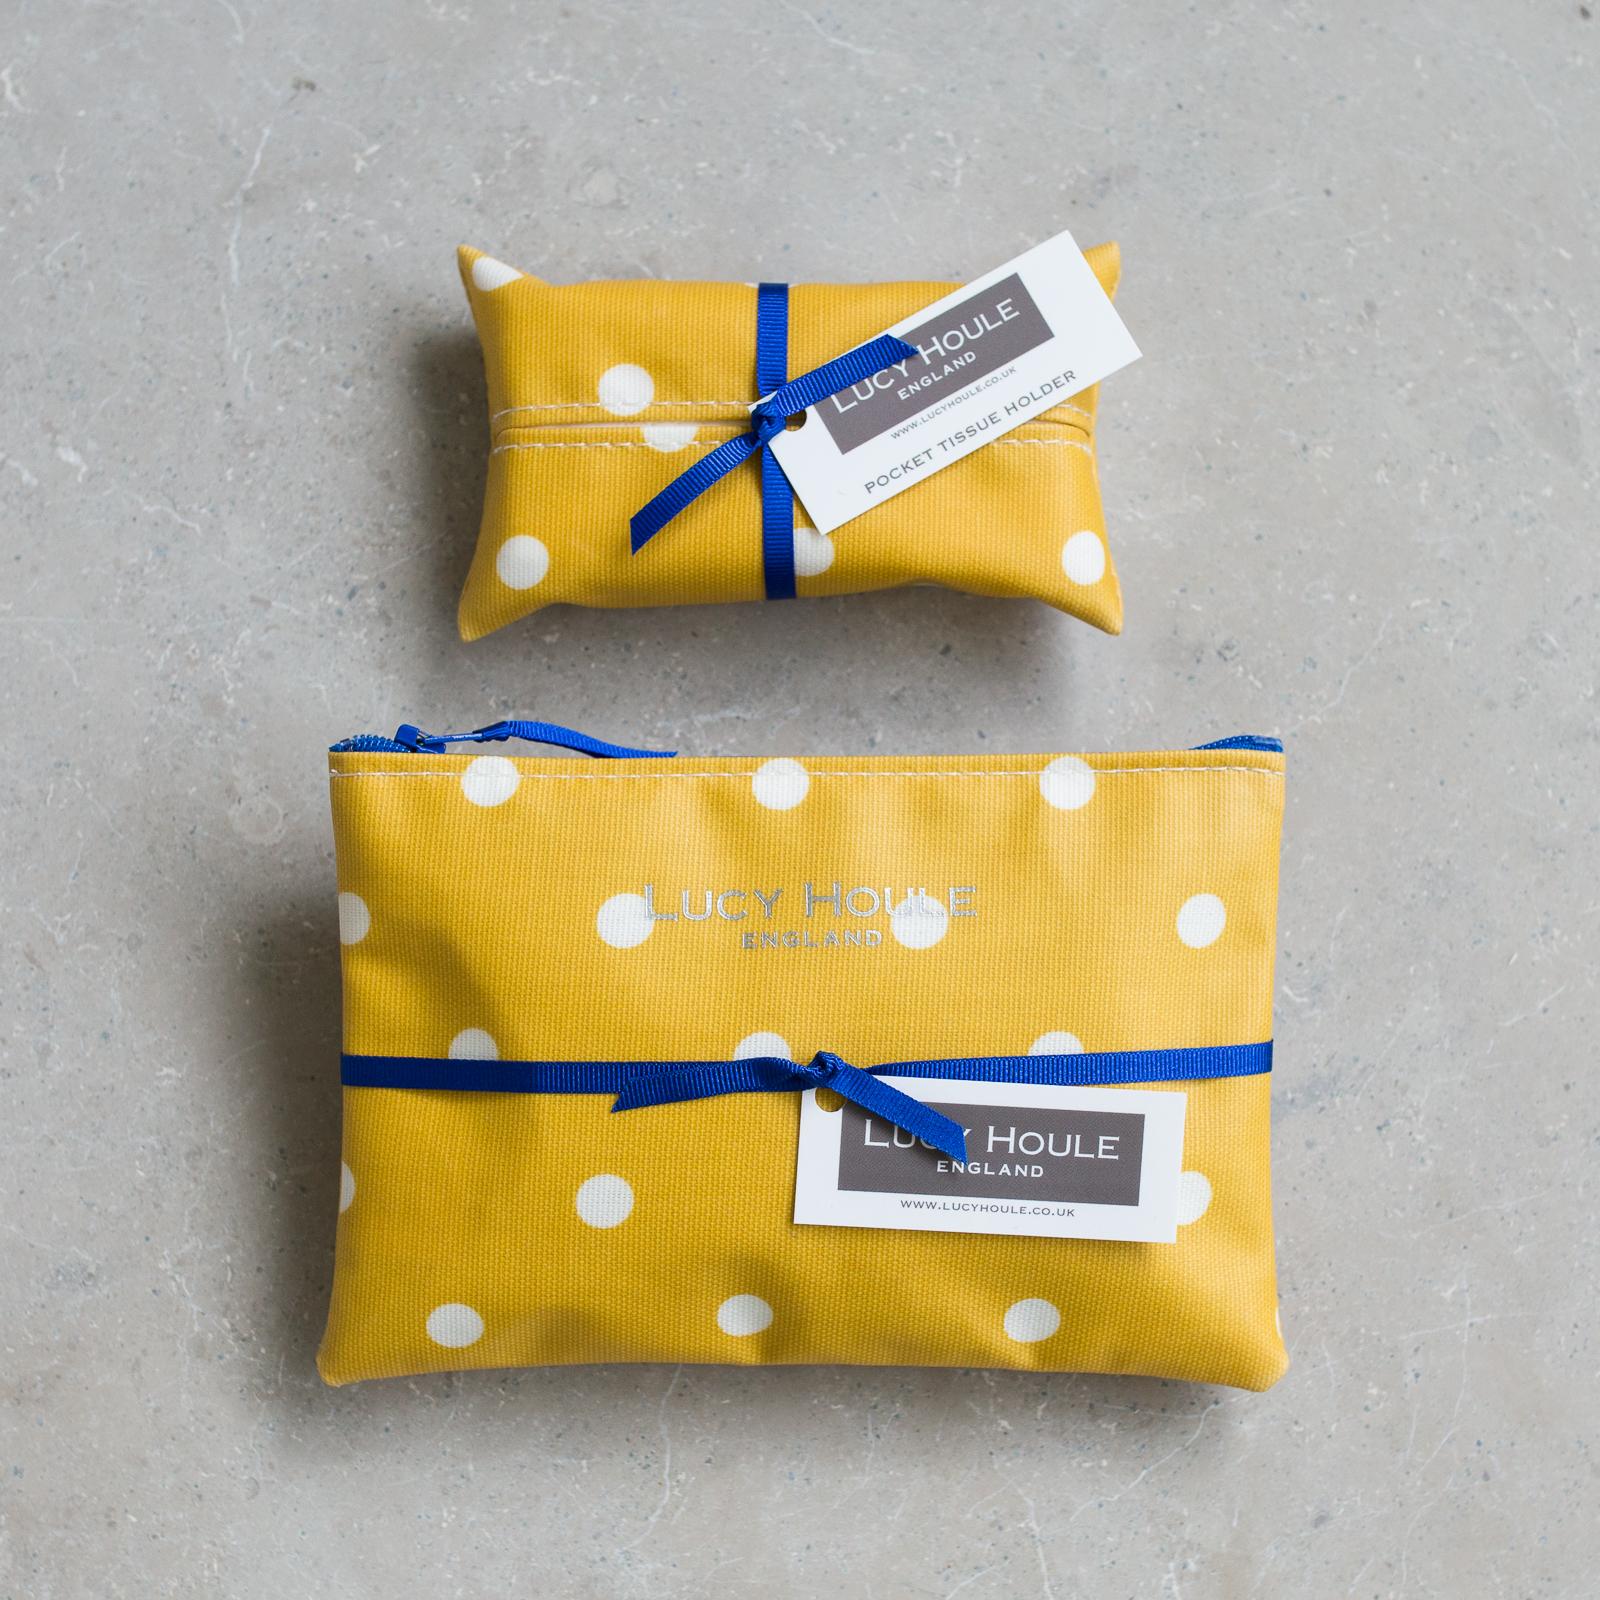 Honey & White Spot Handbag Set Navy Zip